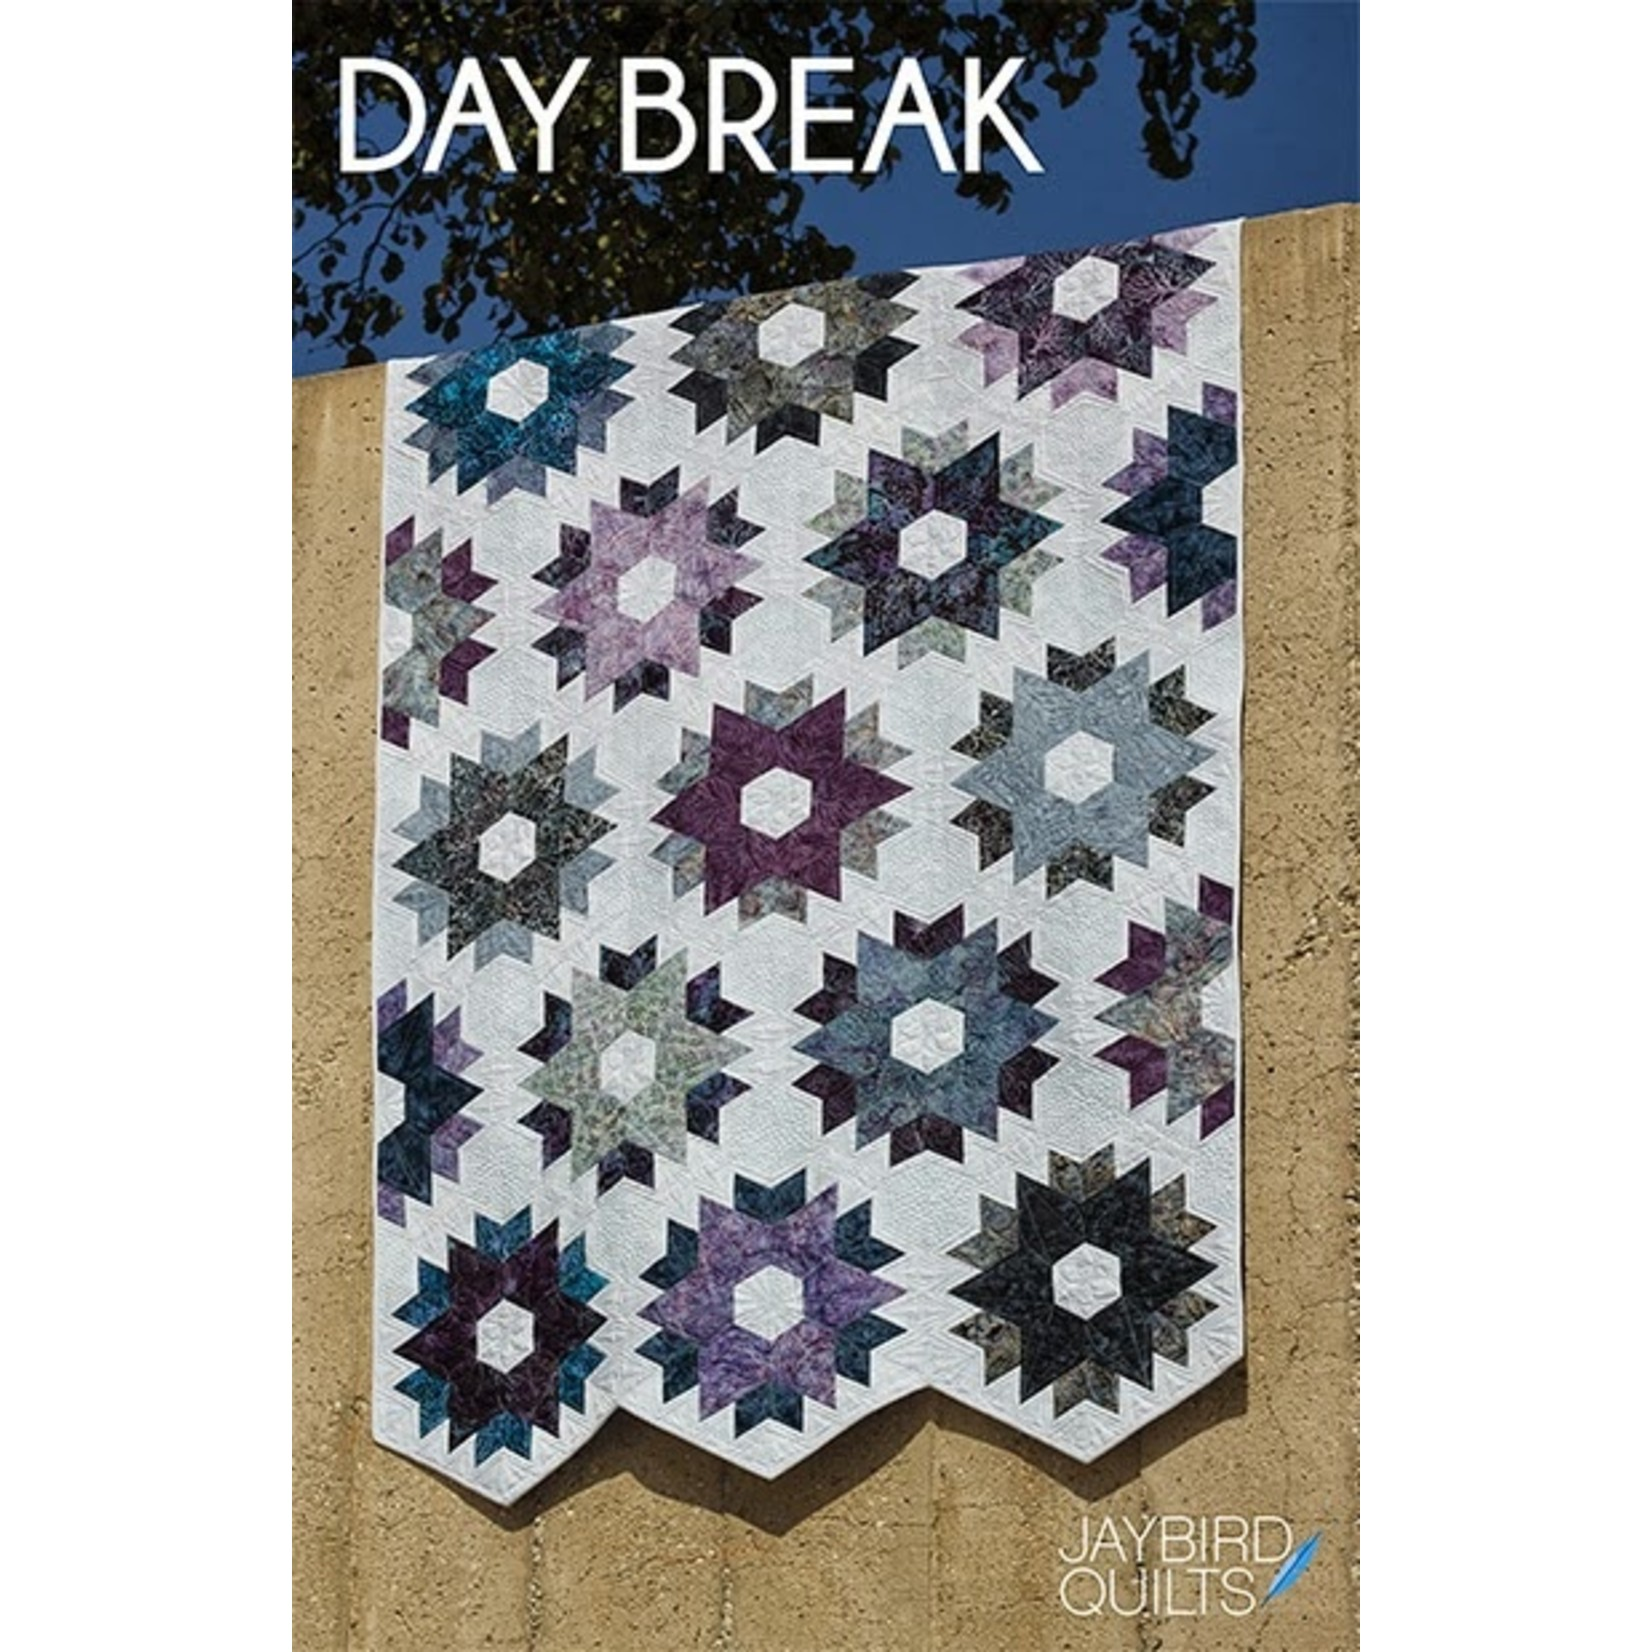 Jaybird Quilts DAY BREAK PATTERN